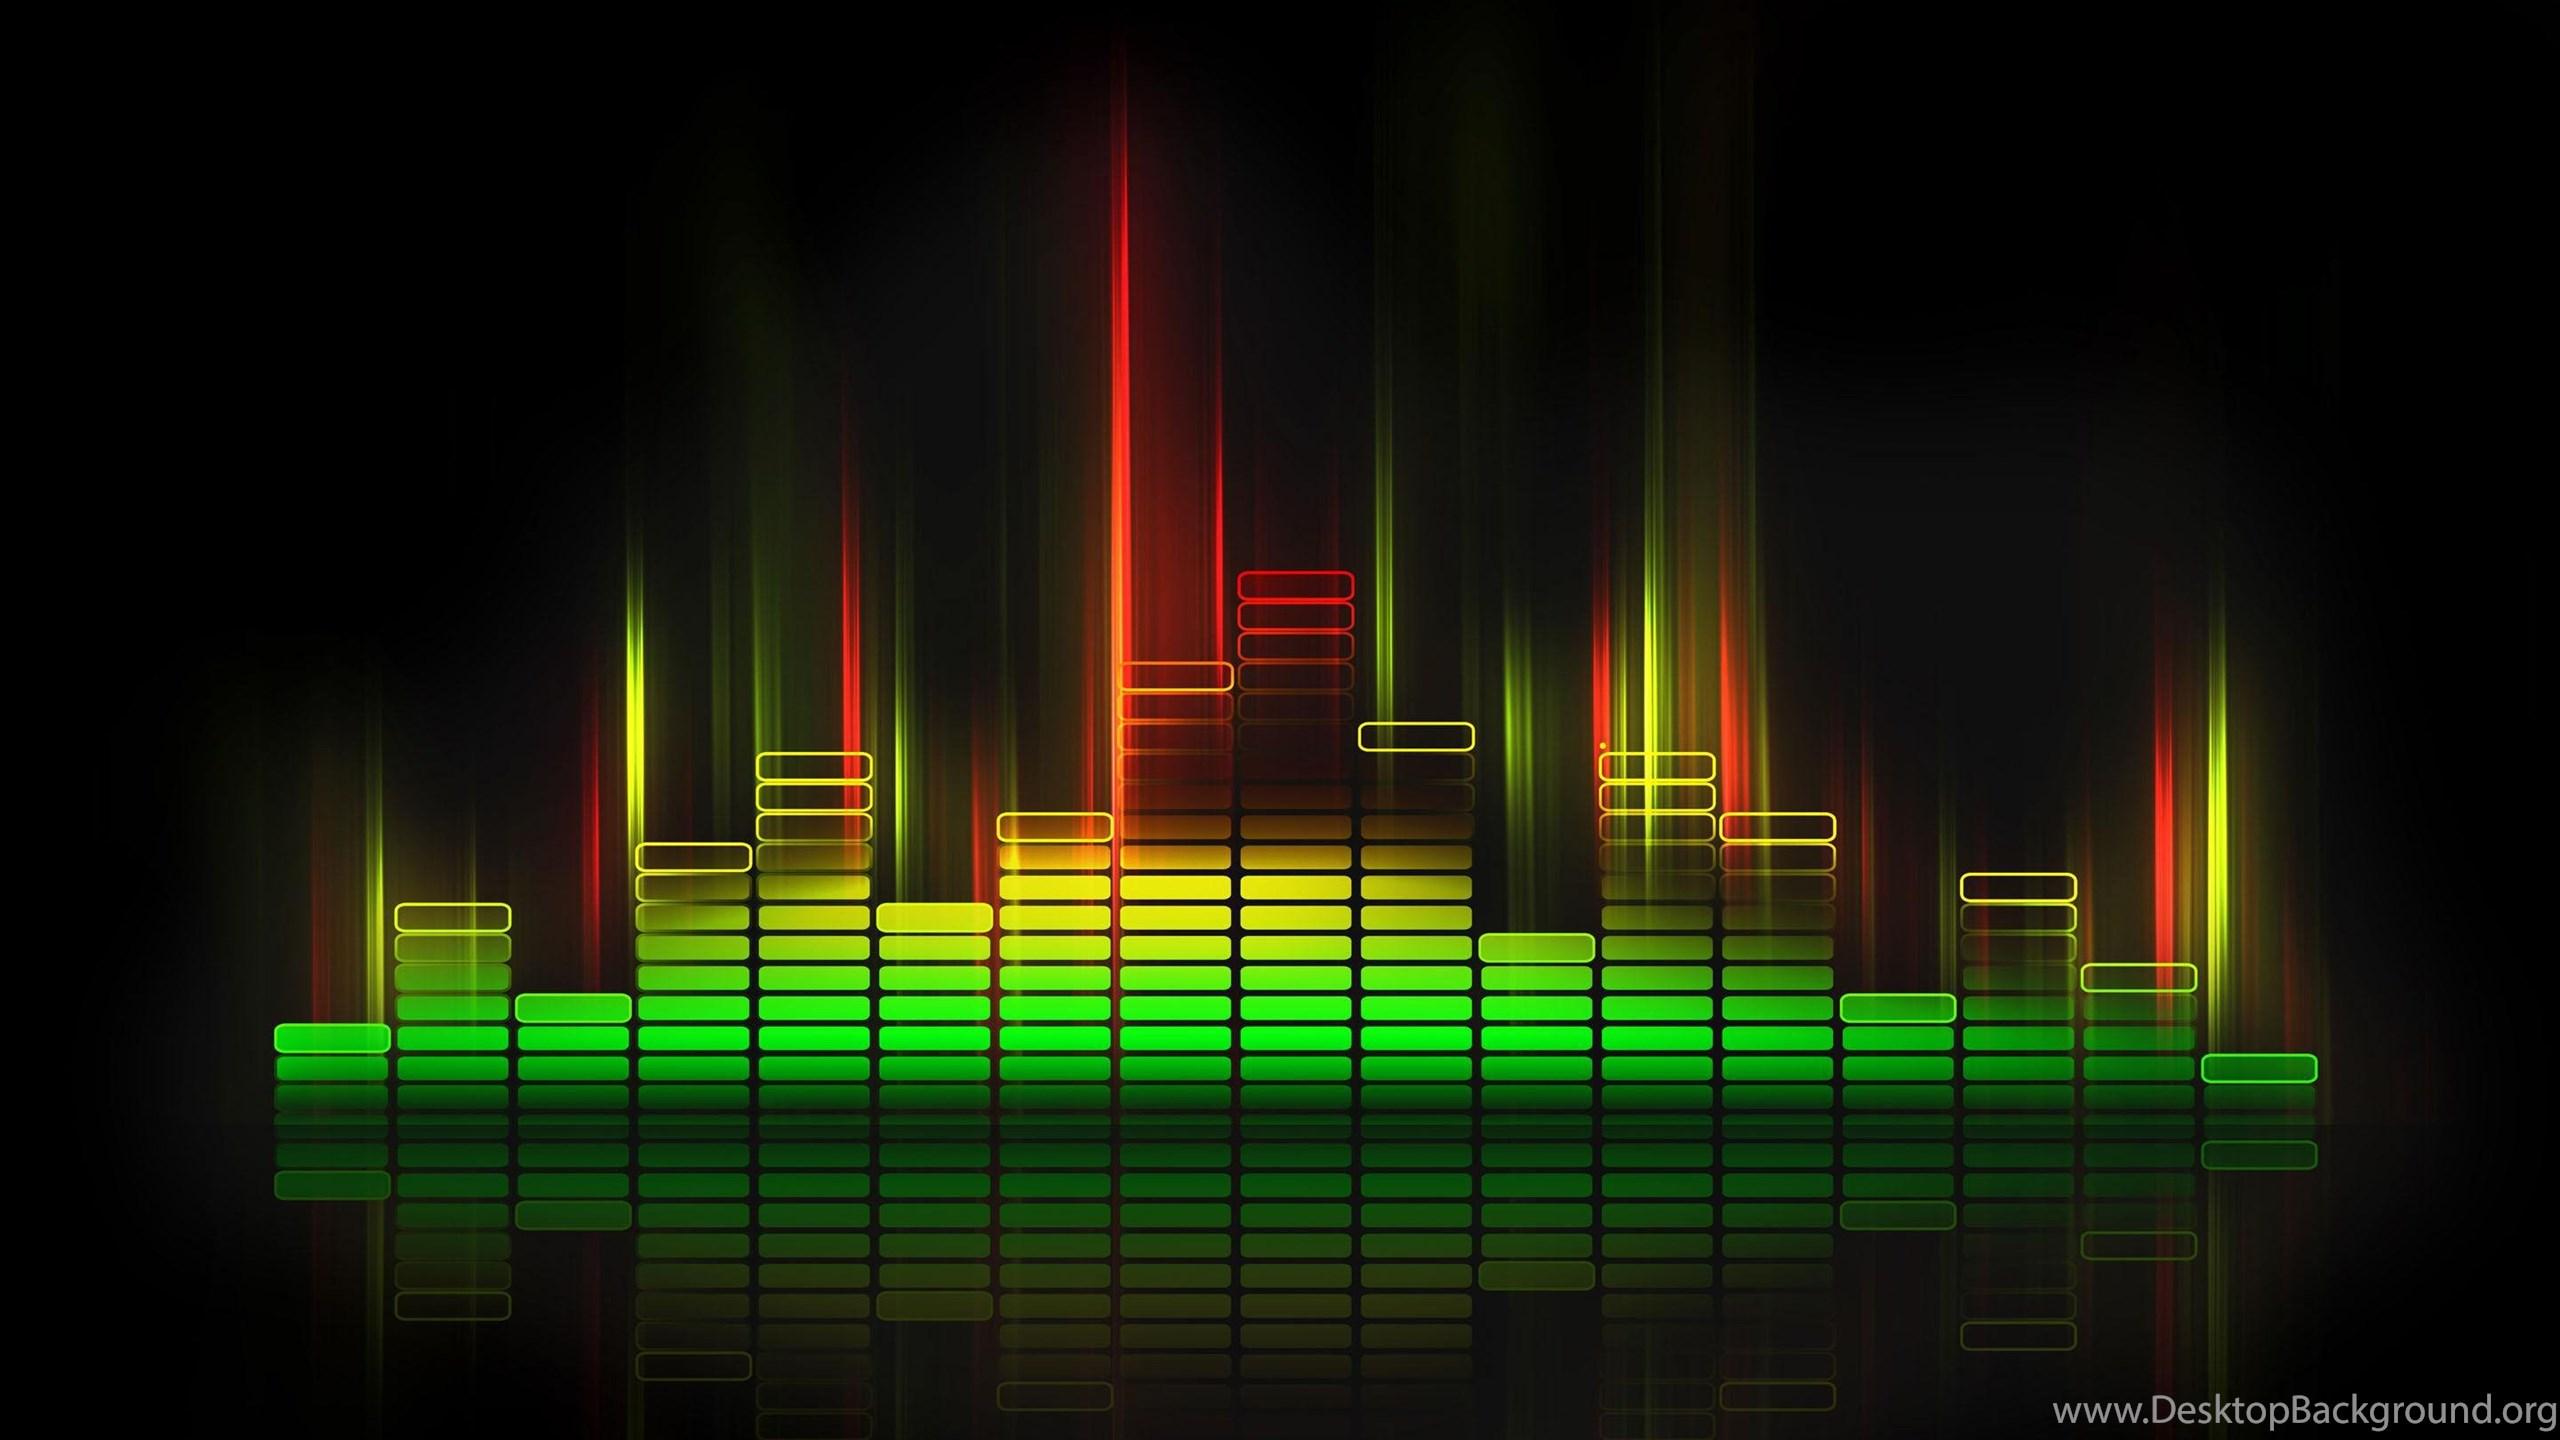 Amazing Wallpaper Music Phone - 740364_cool-music-wallpapers-phone-kemecer-com_2880x1800_h  Photograph_263057.jpg